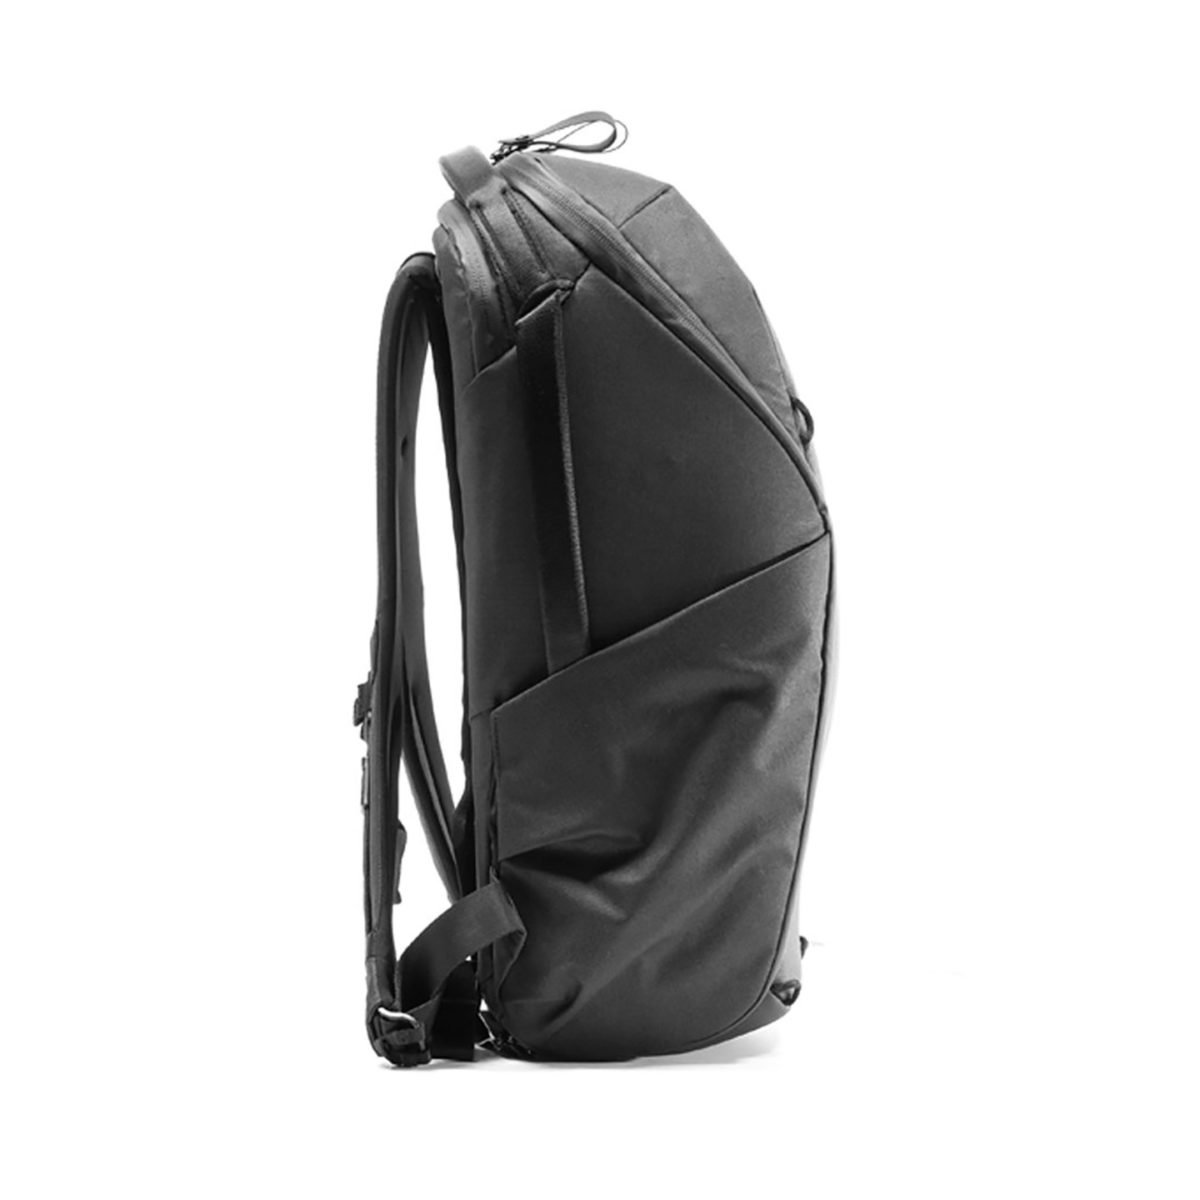 peak_design_everyday_backpack_zip_v2_bk_02